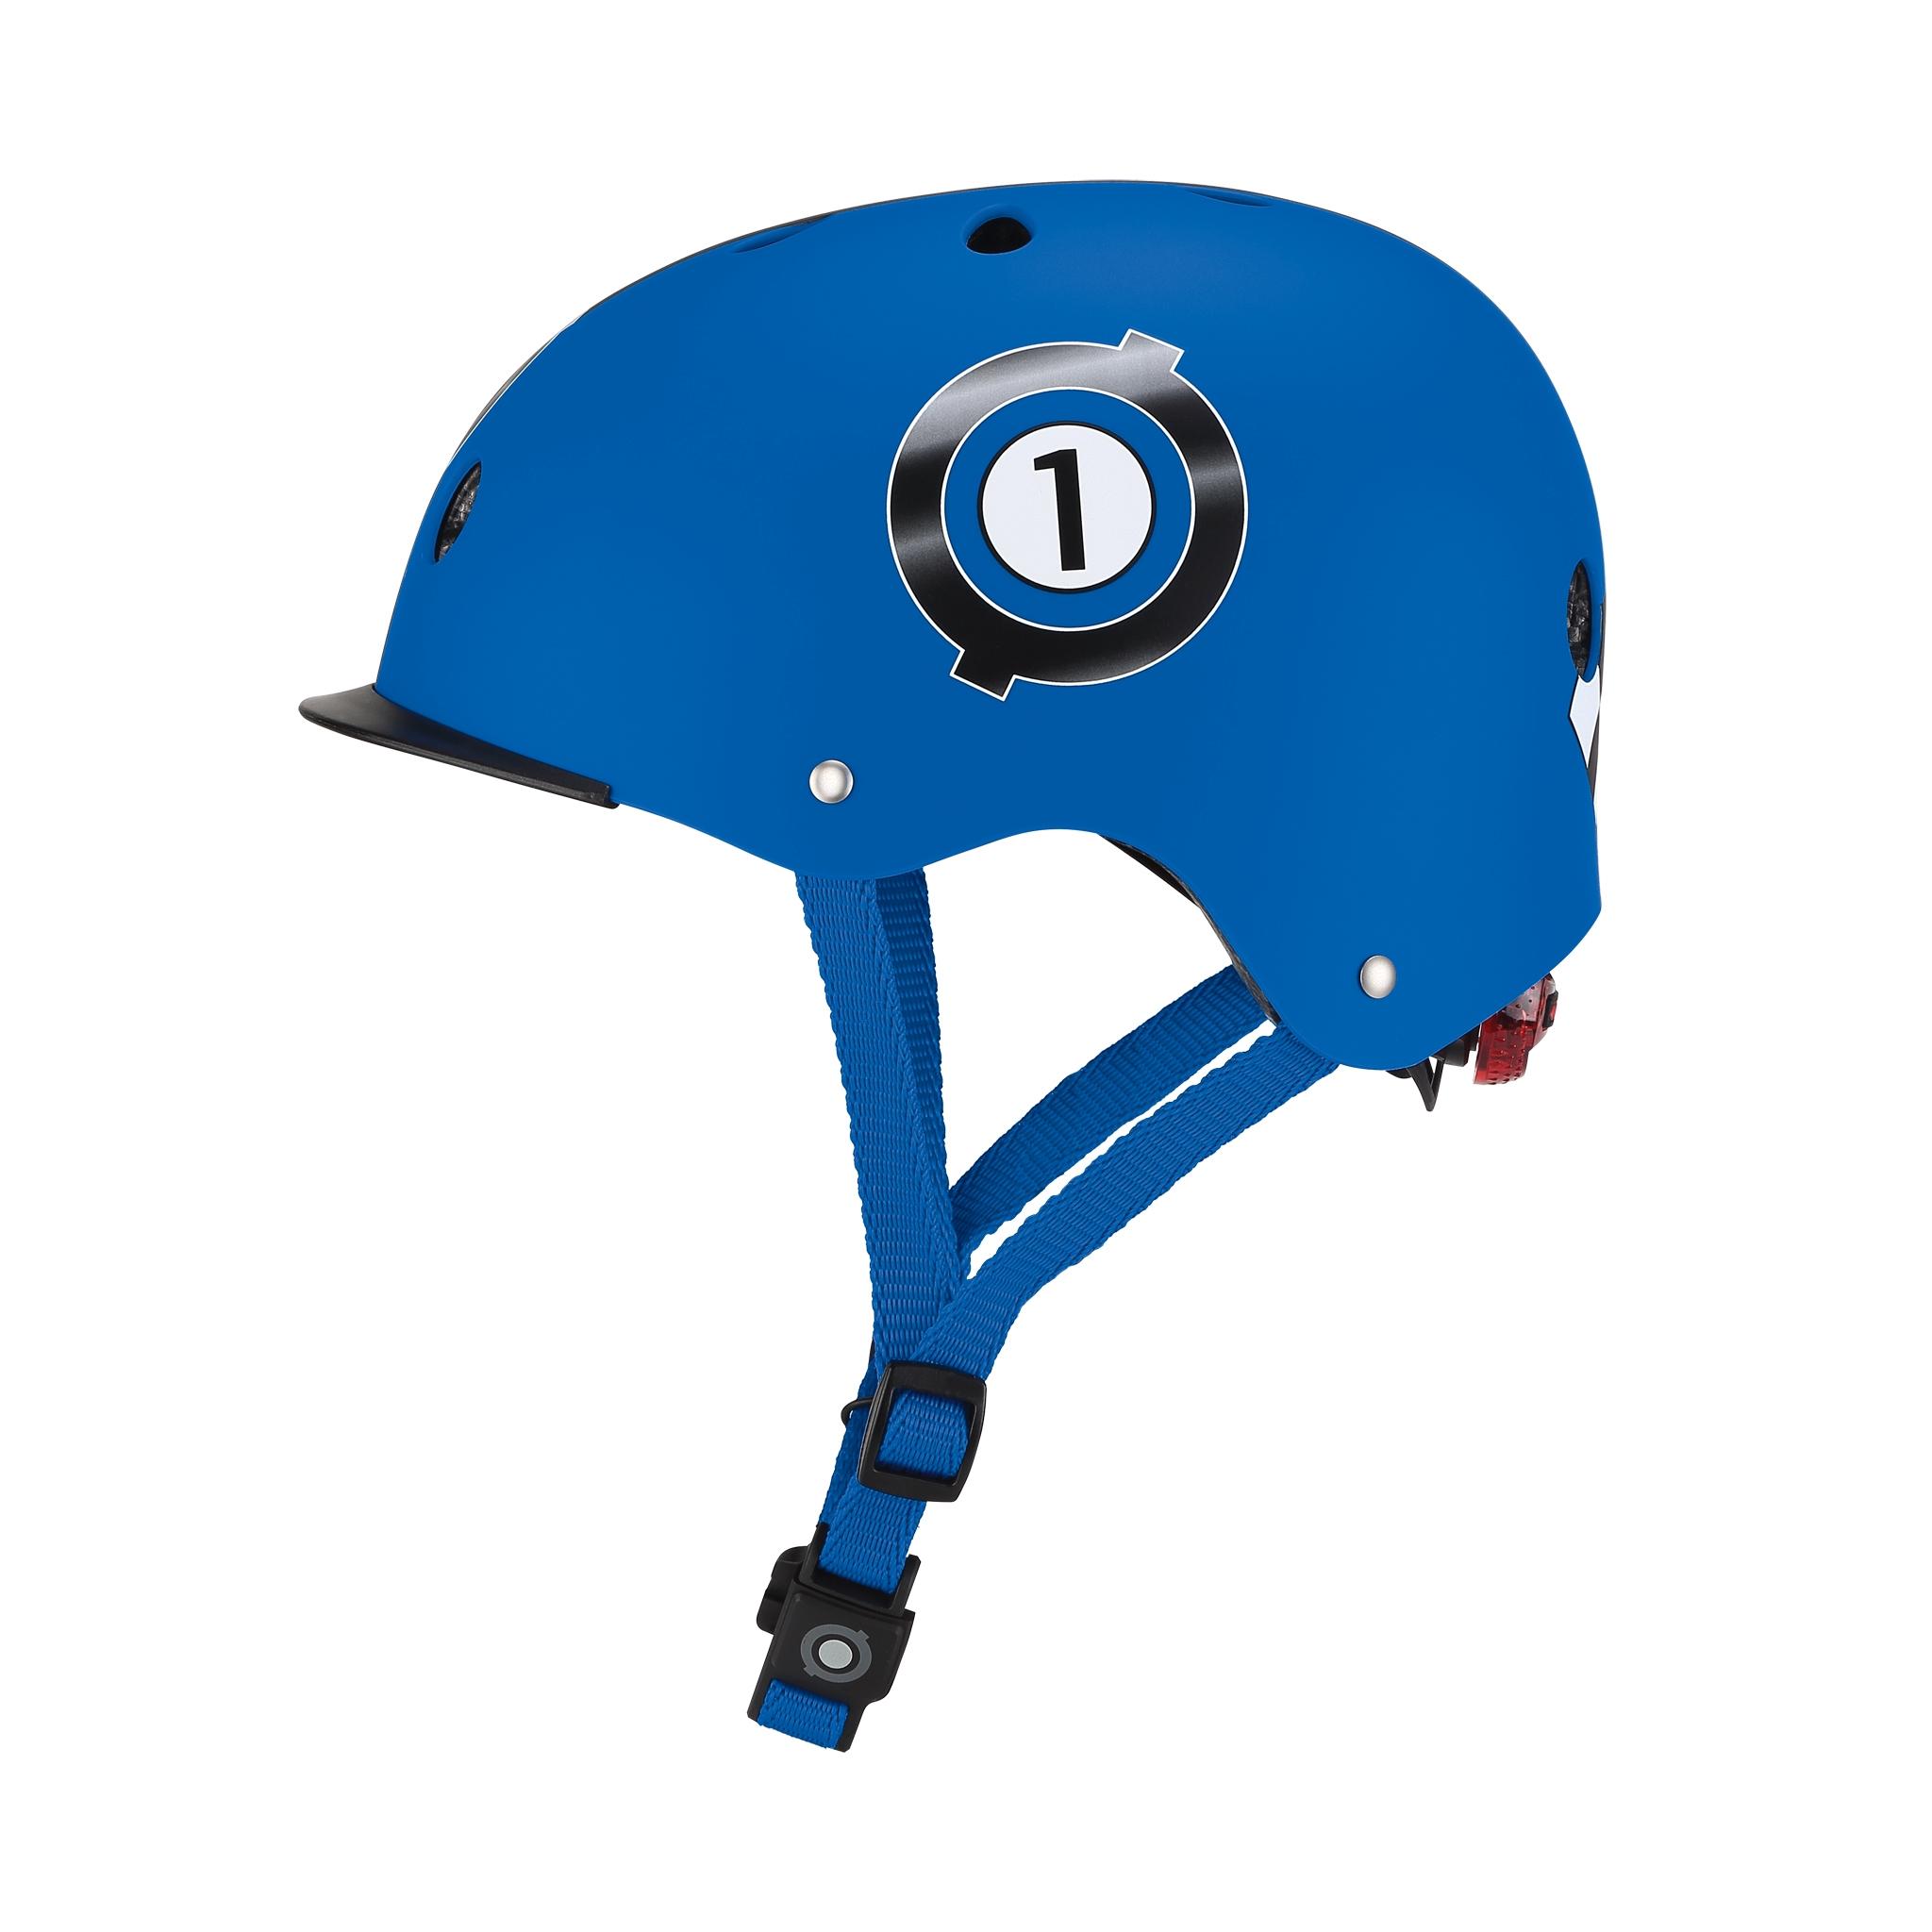 ELITE-helmets-scooter-helmets-for-kids-with-adjustable-helmet-knob-navy-blue 1